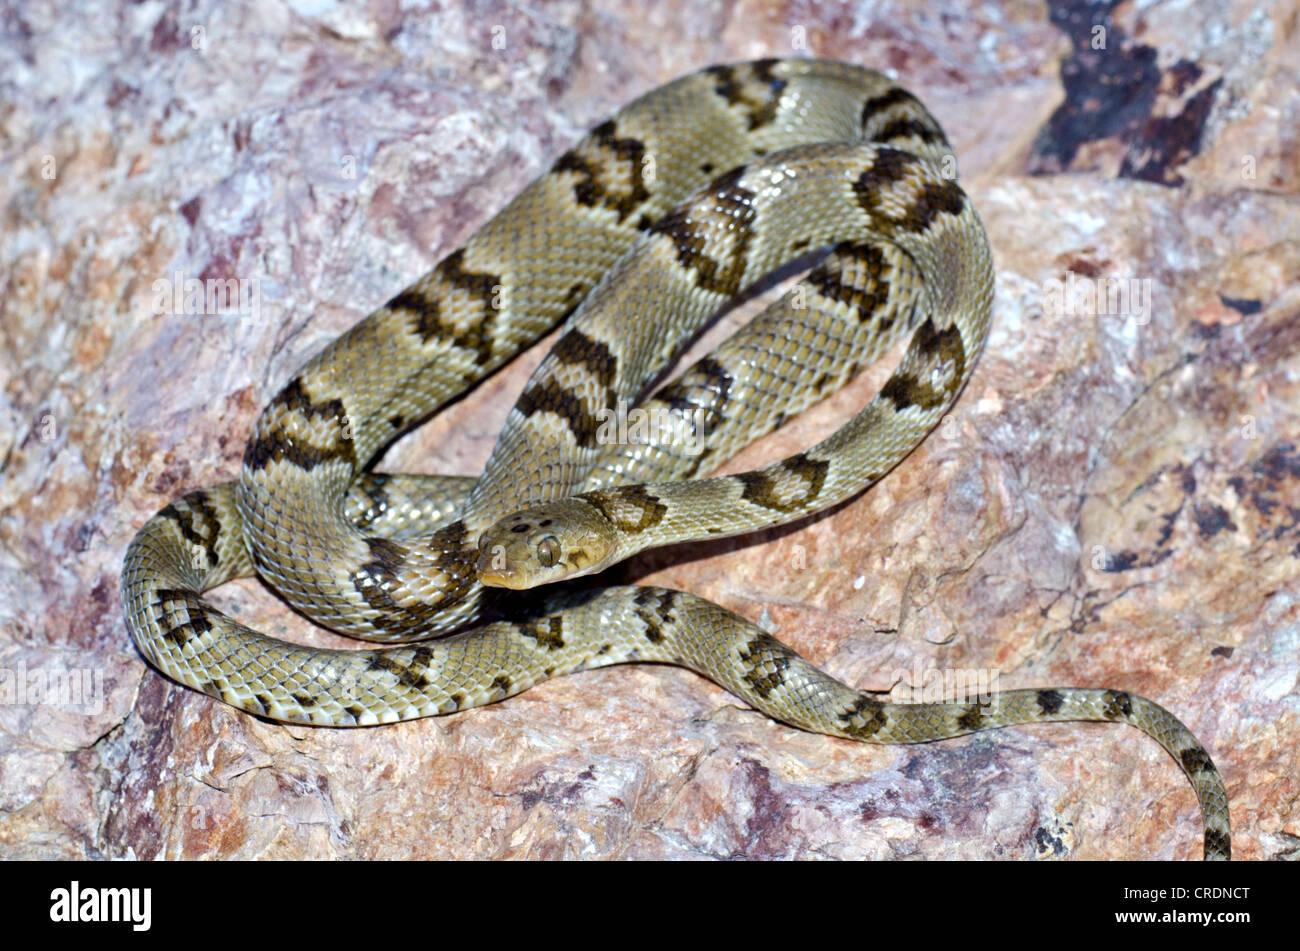 Chihuahuan Lyre Snake, (Trimorphodon vilkonsoni), Black Gap Wildlife Management Area, Brewster county, Texas, USA. - Stock Image